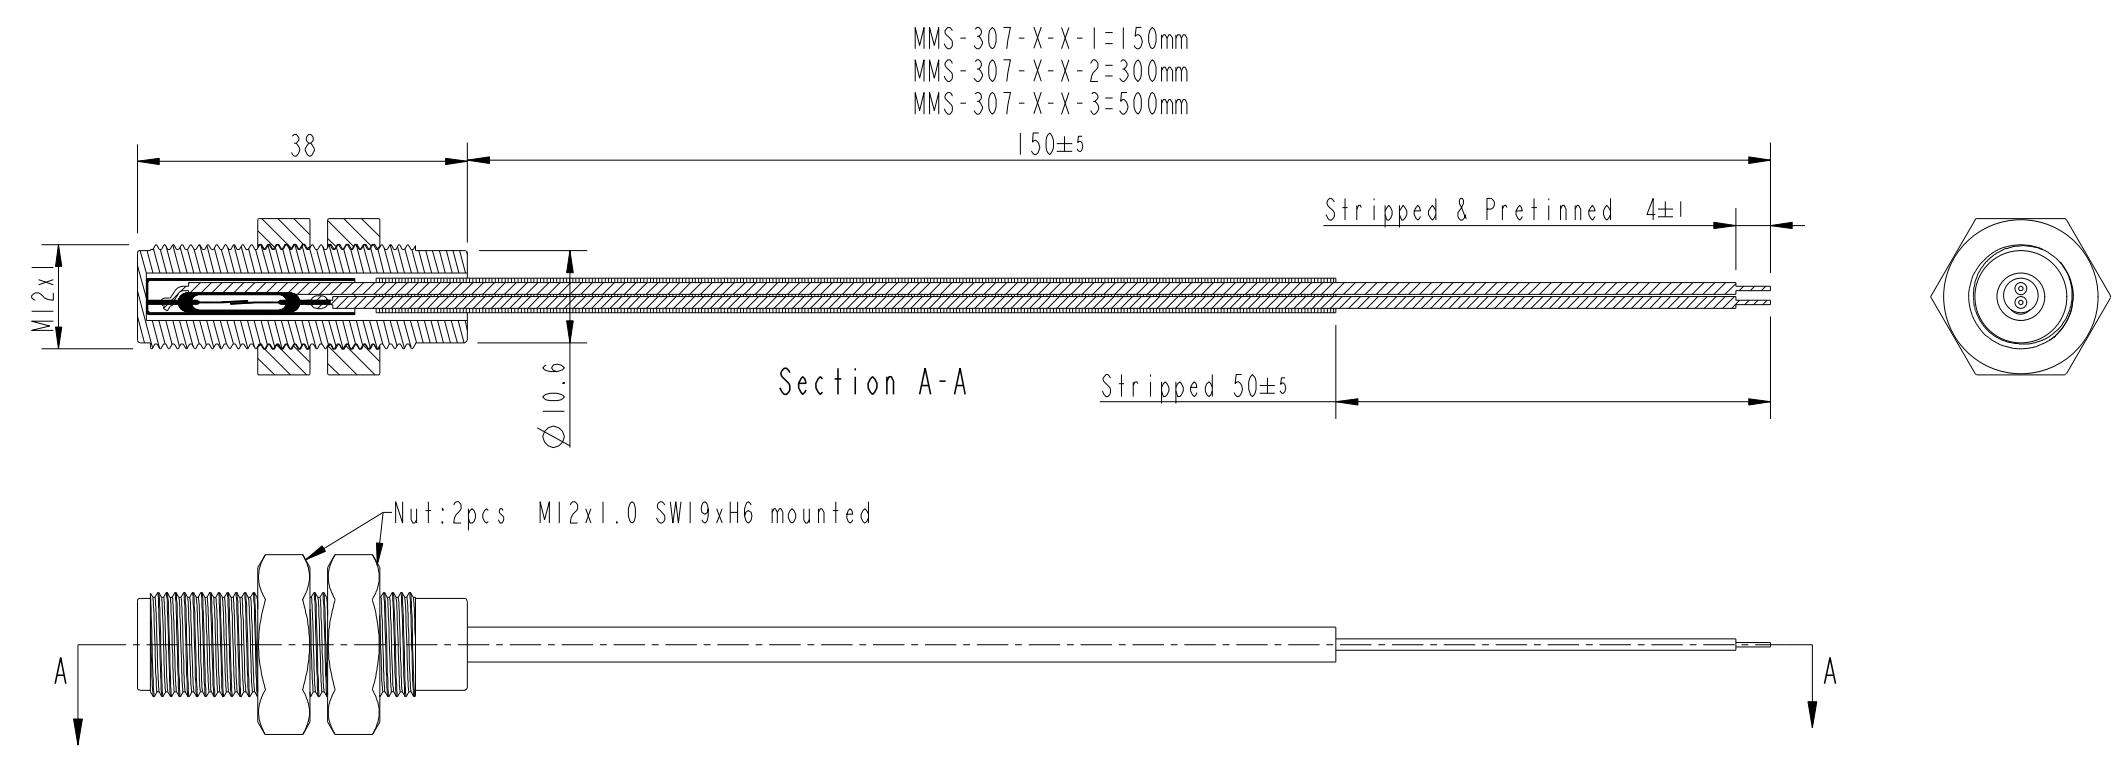 MMS-307